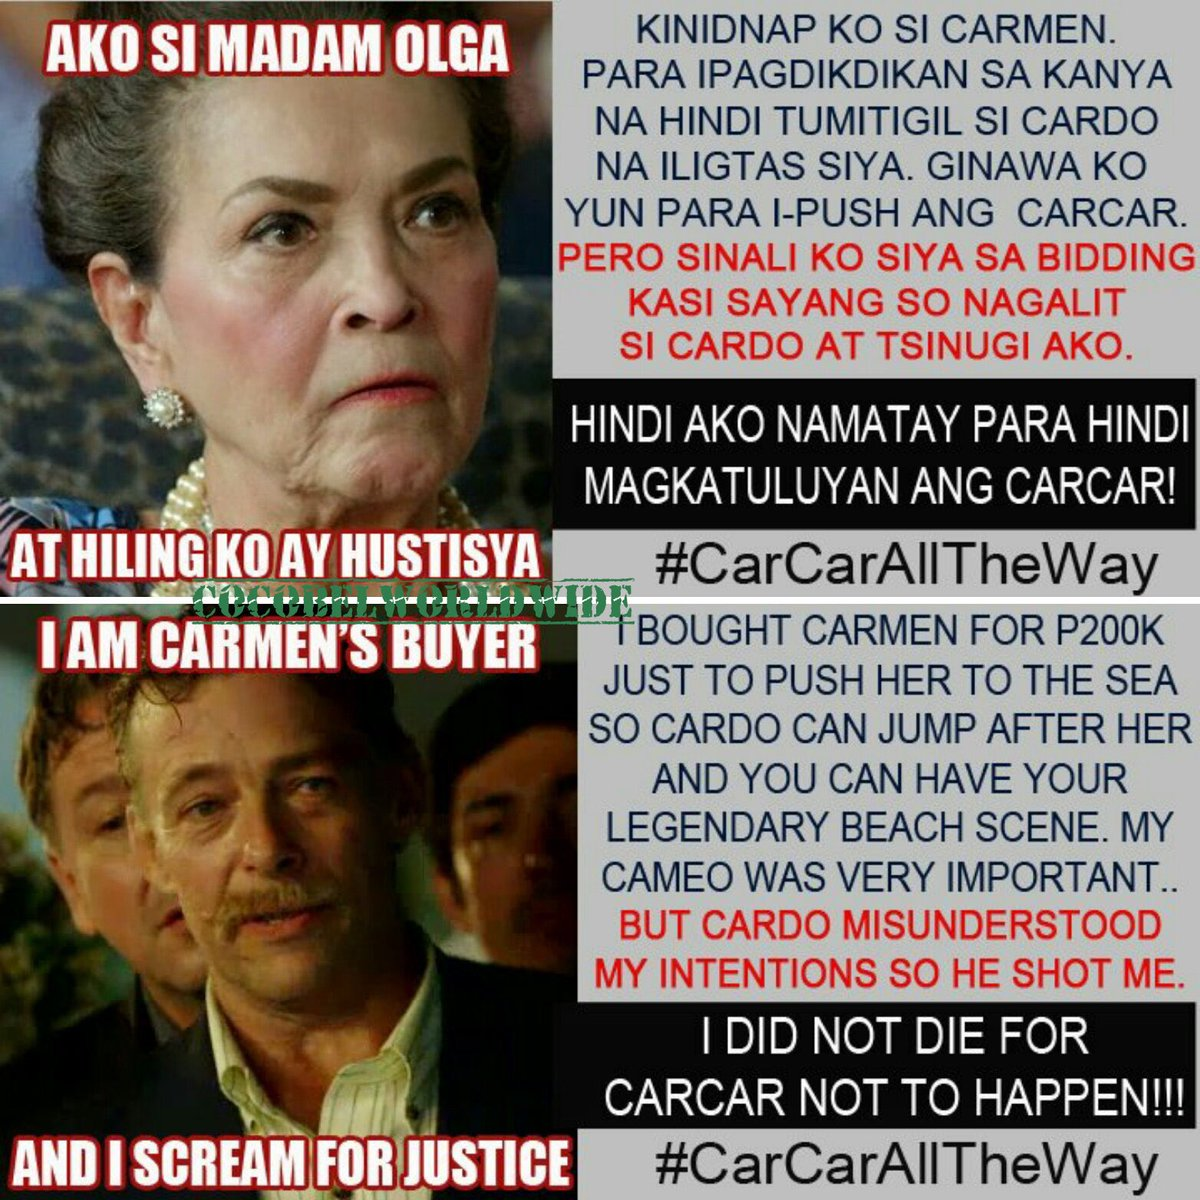 Justice For The Guest Stars Yan Niyo Po Ng Purpose Pagkawala Nila Hustisya Lol Hiness Carmenpic Twitter Wgq0jfwacs